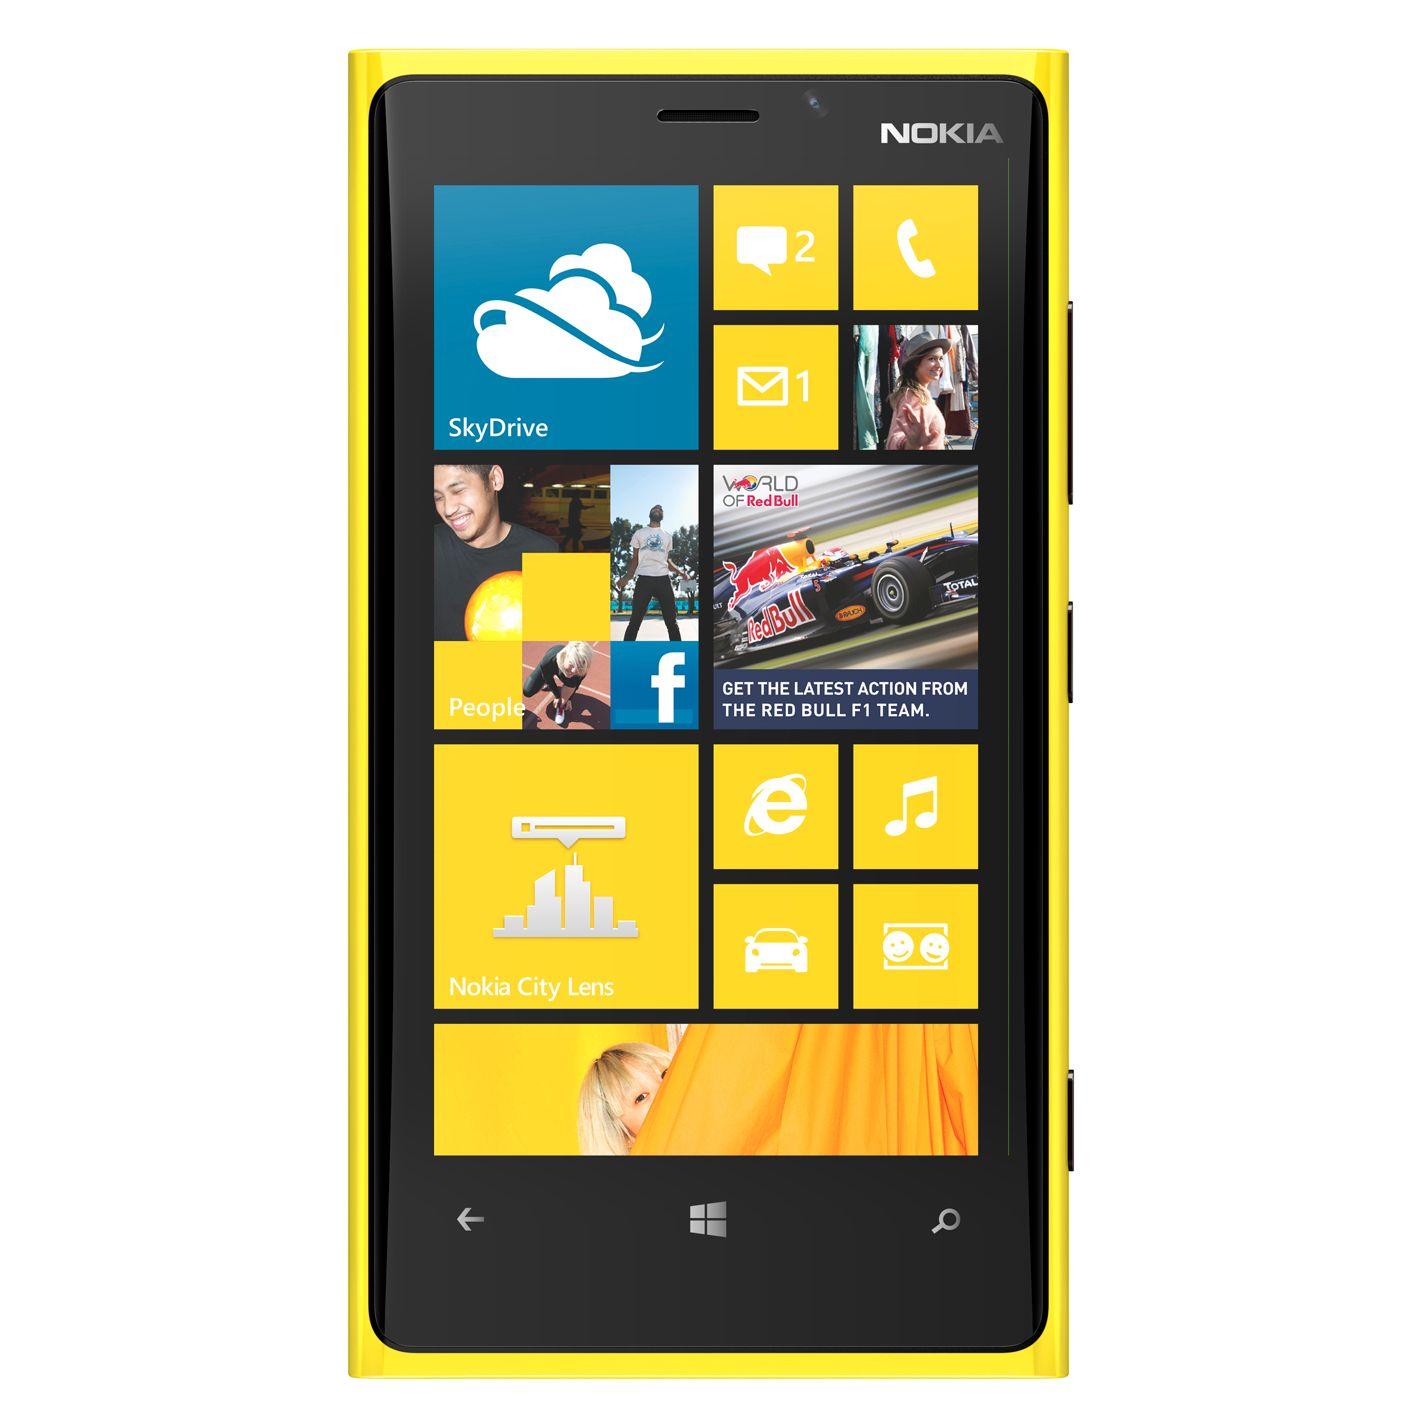 Fremover vil Lumia-serien og Windows Mobile være Nokias eneste satsning på smarttelefonfronten.Foto: Nokia